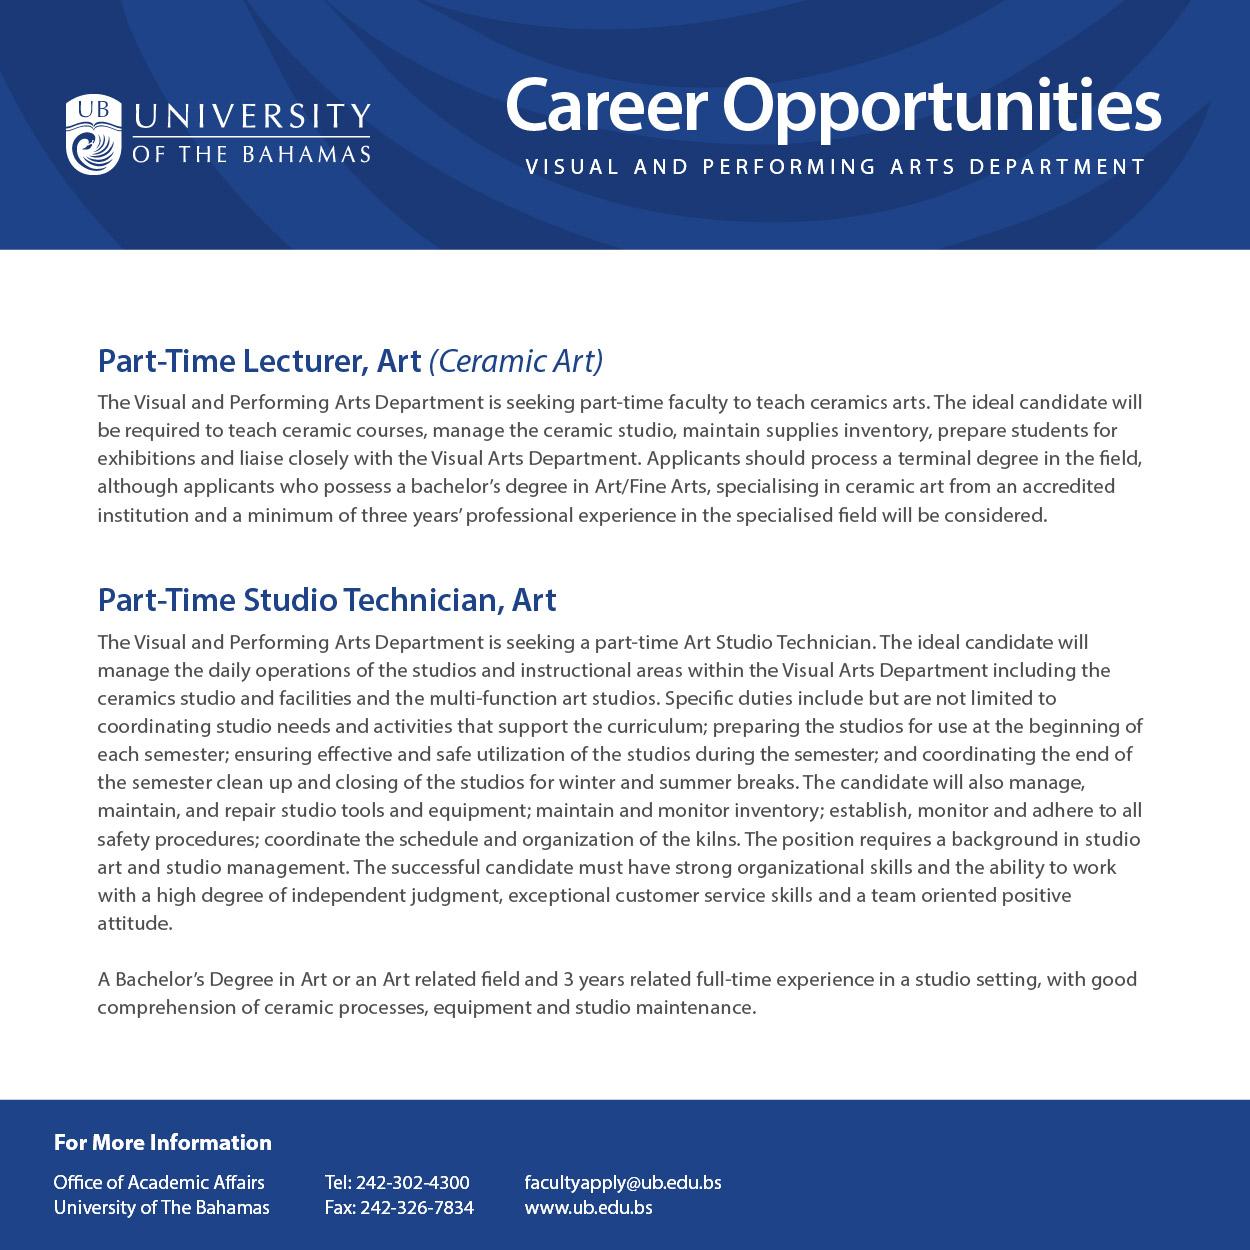 UB Visual Arts - Career Opportunities (March 2017 Ad).jpg